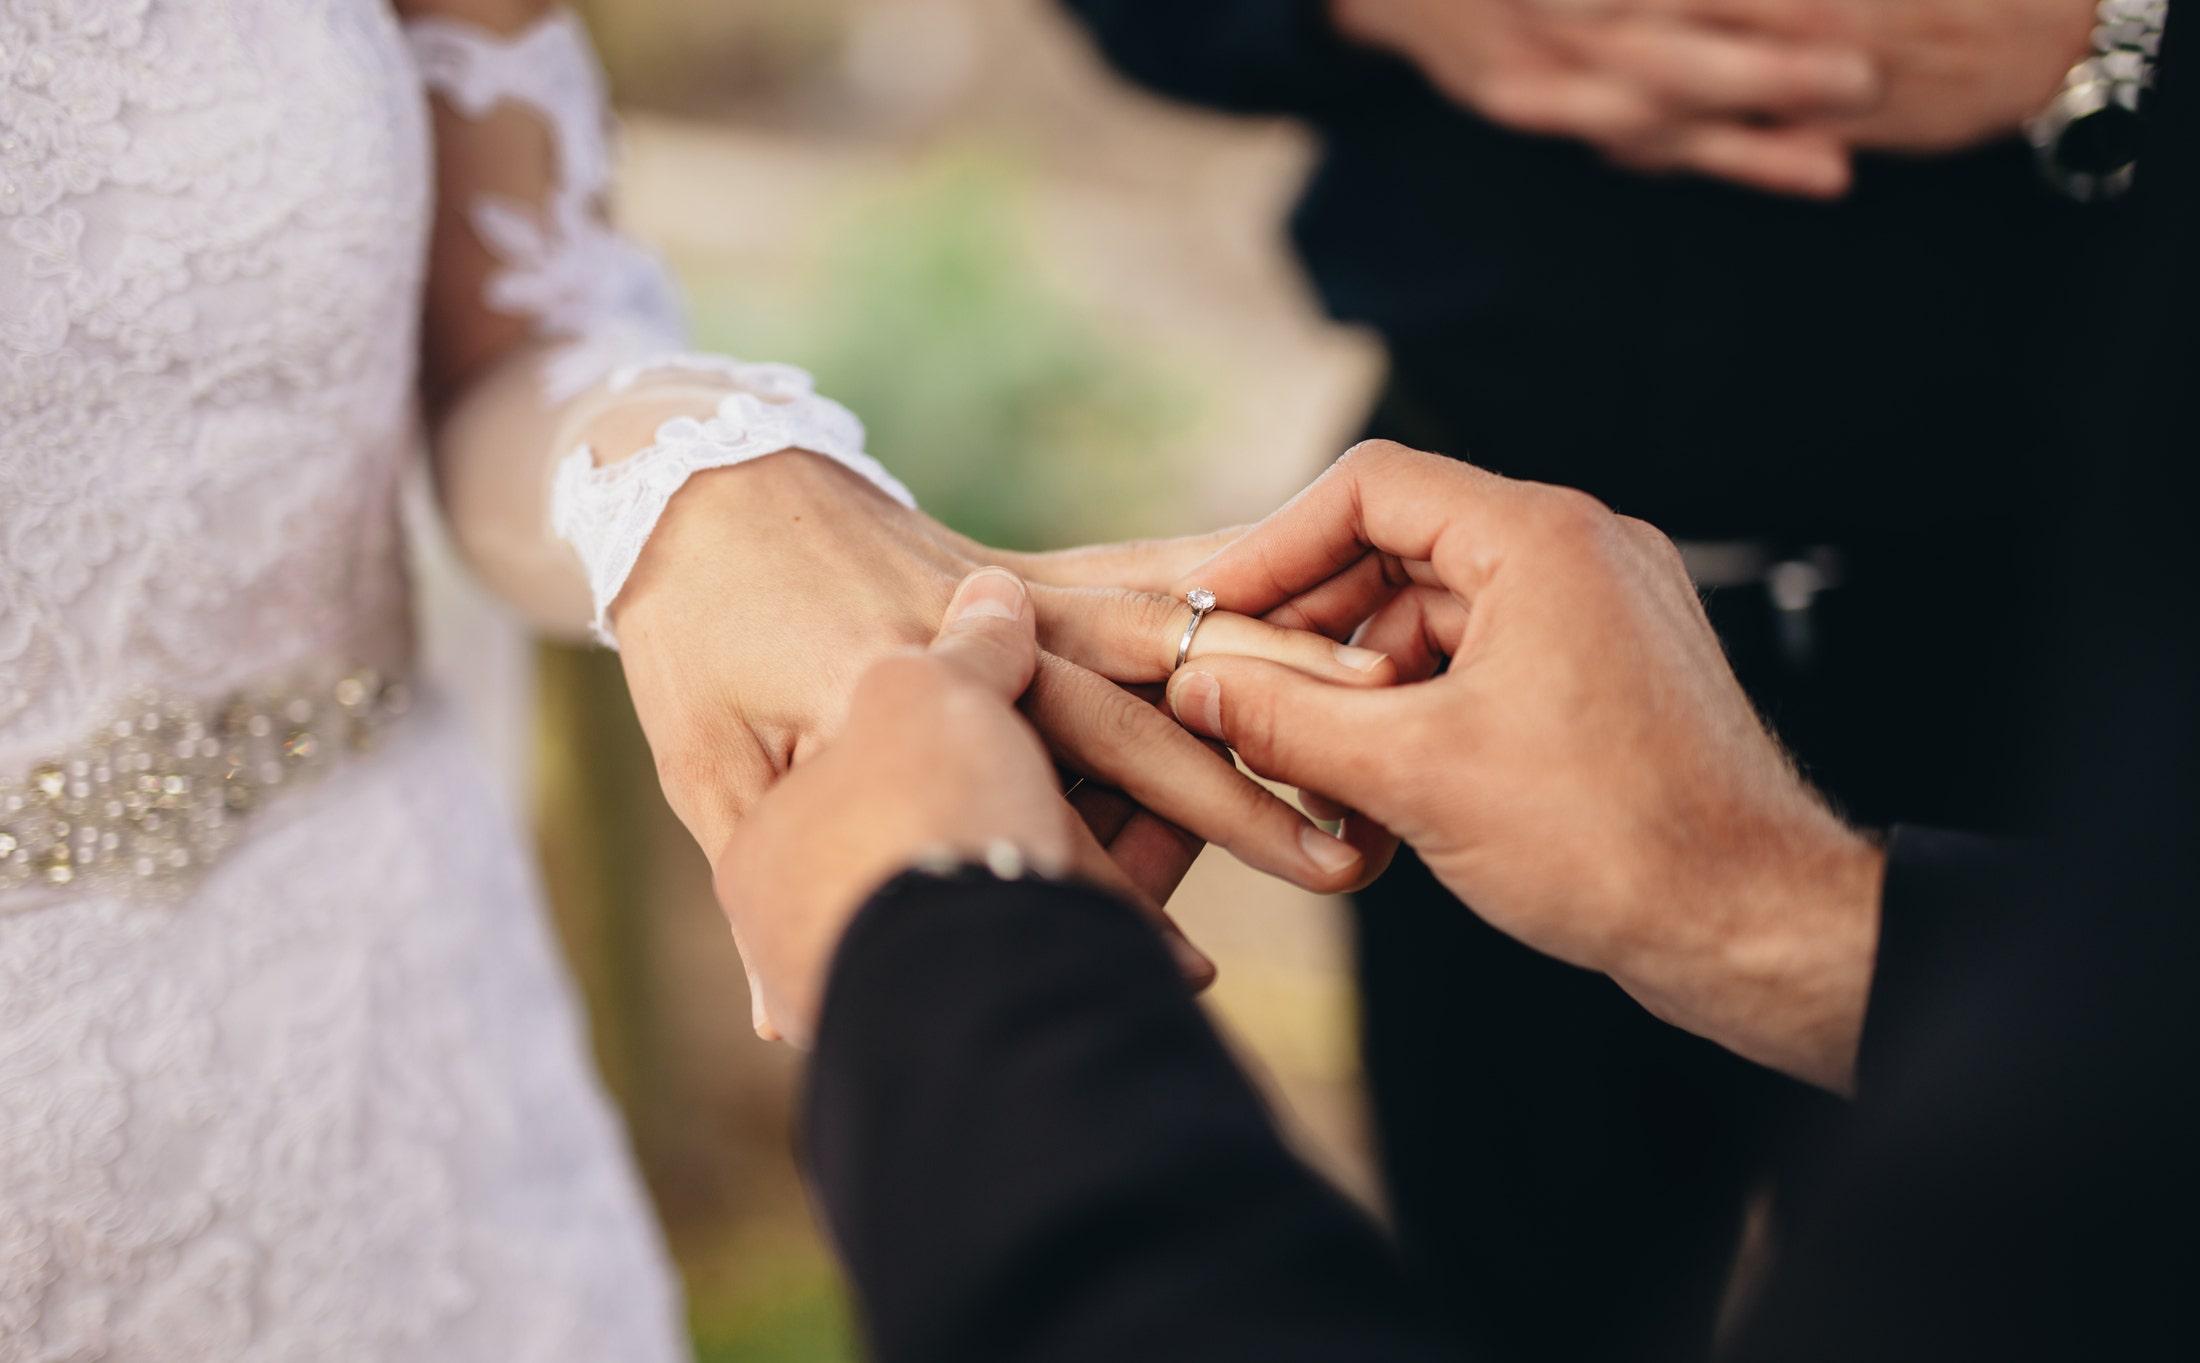 Couple who scrapped wedding due to coronavirus buys camper van instead - fox